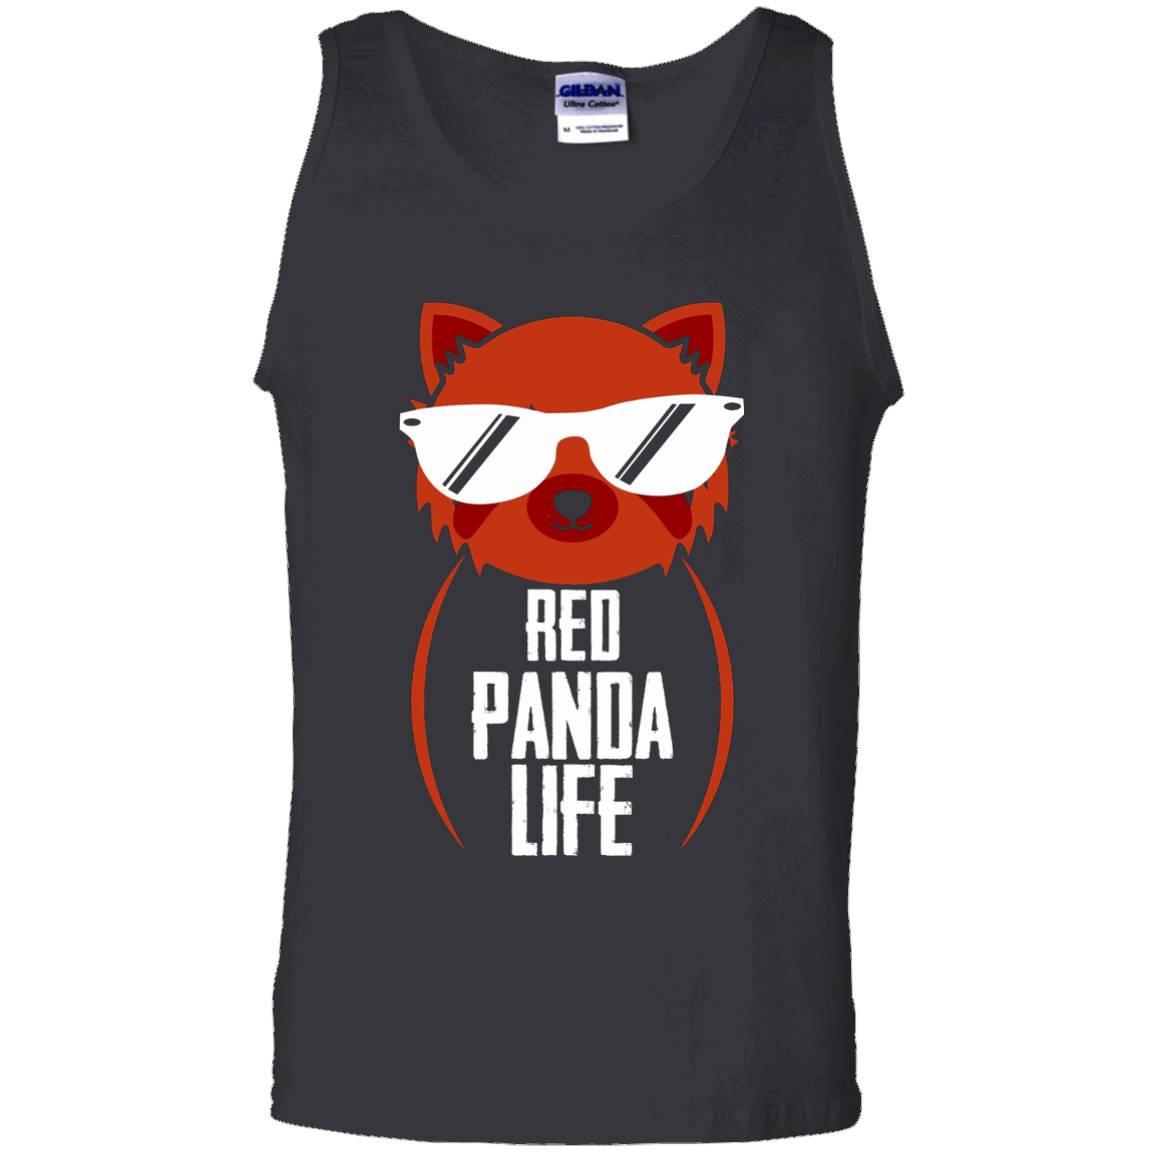 Red Panda Shirt – Red Panda Life Shirt – Tank Top